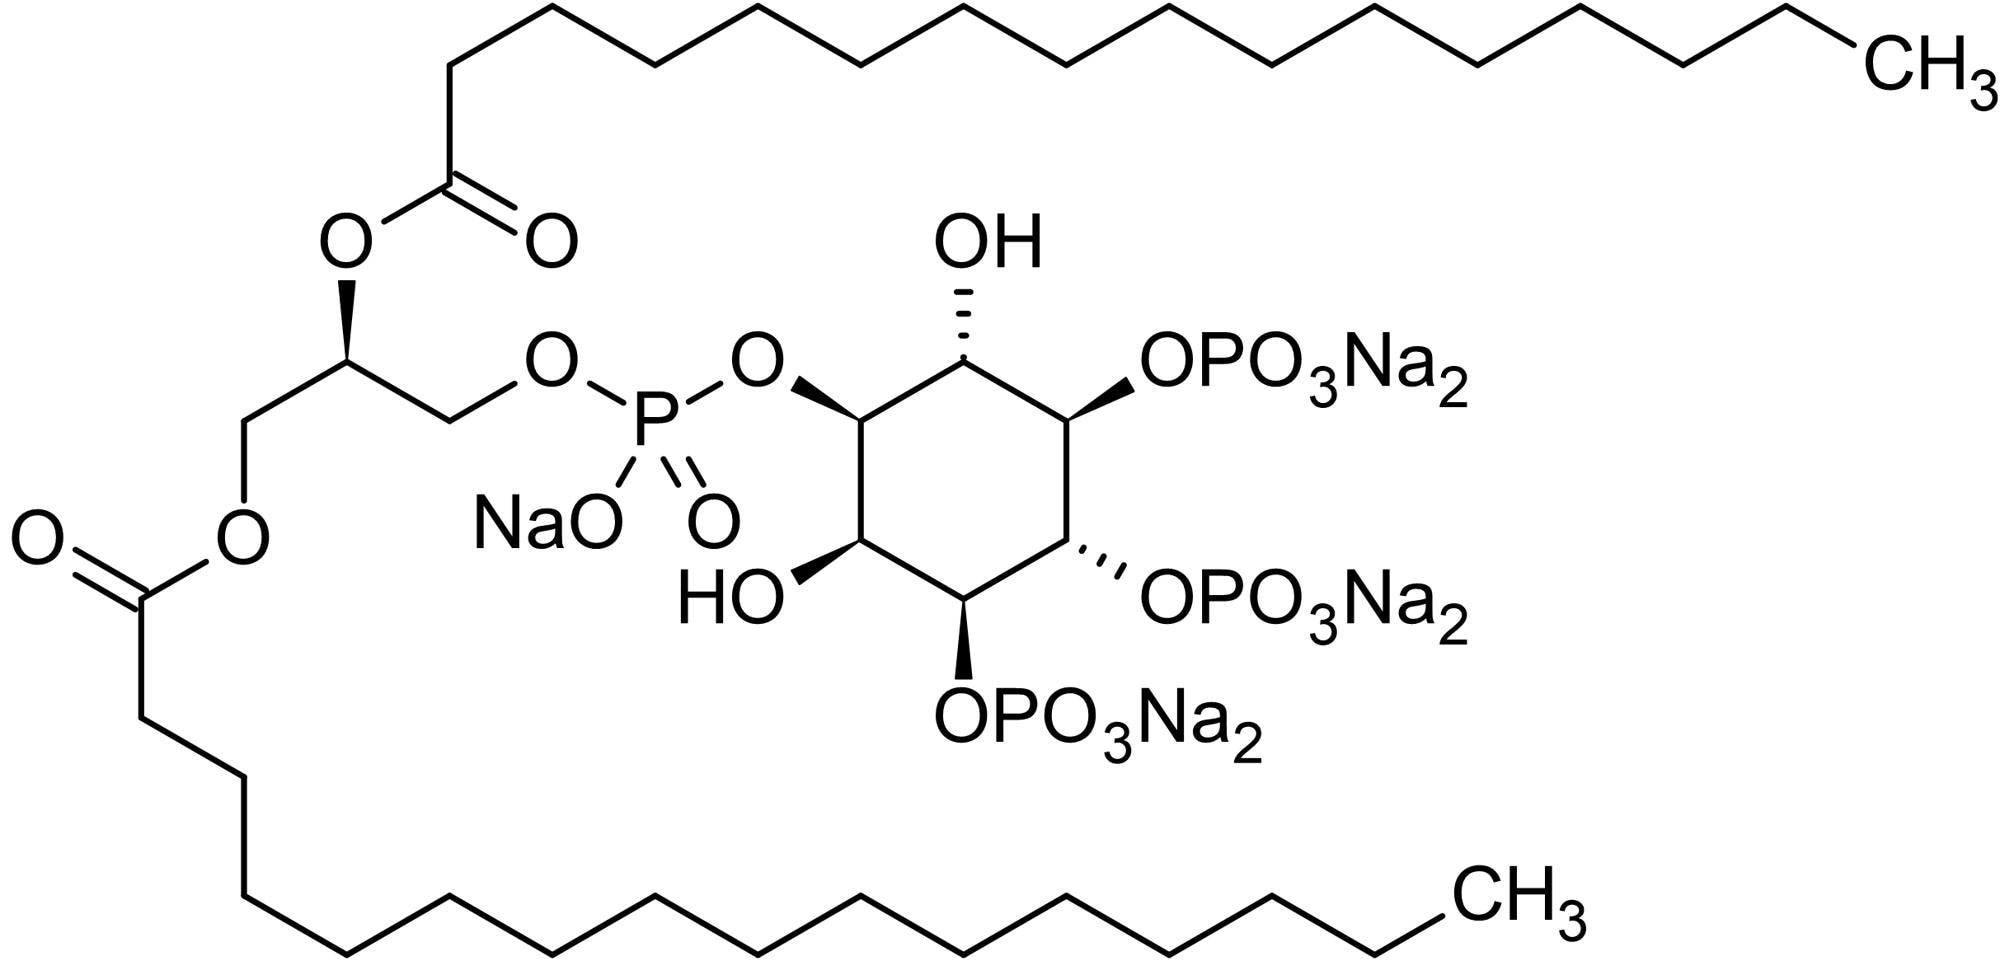 Chemical Structure - L-alpha-Phosphatidylinositol-3,4,5-trisphosphate sodium salt, PKC delta, epsilon and eta activator (ab145221)